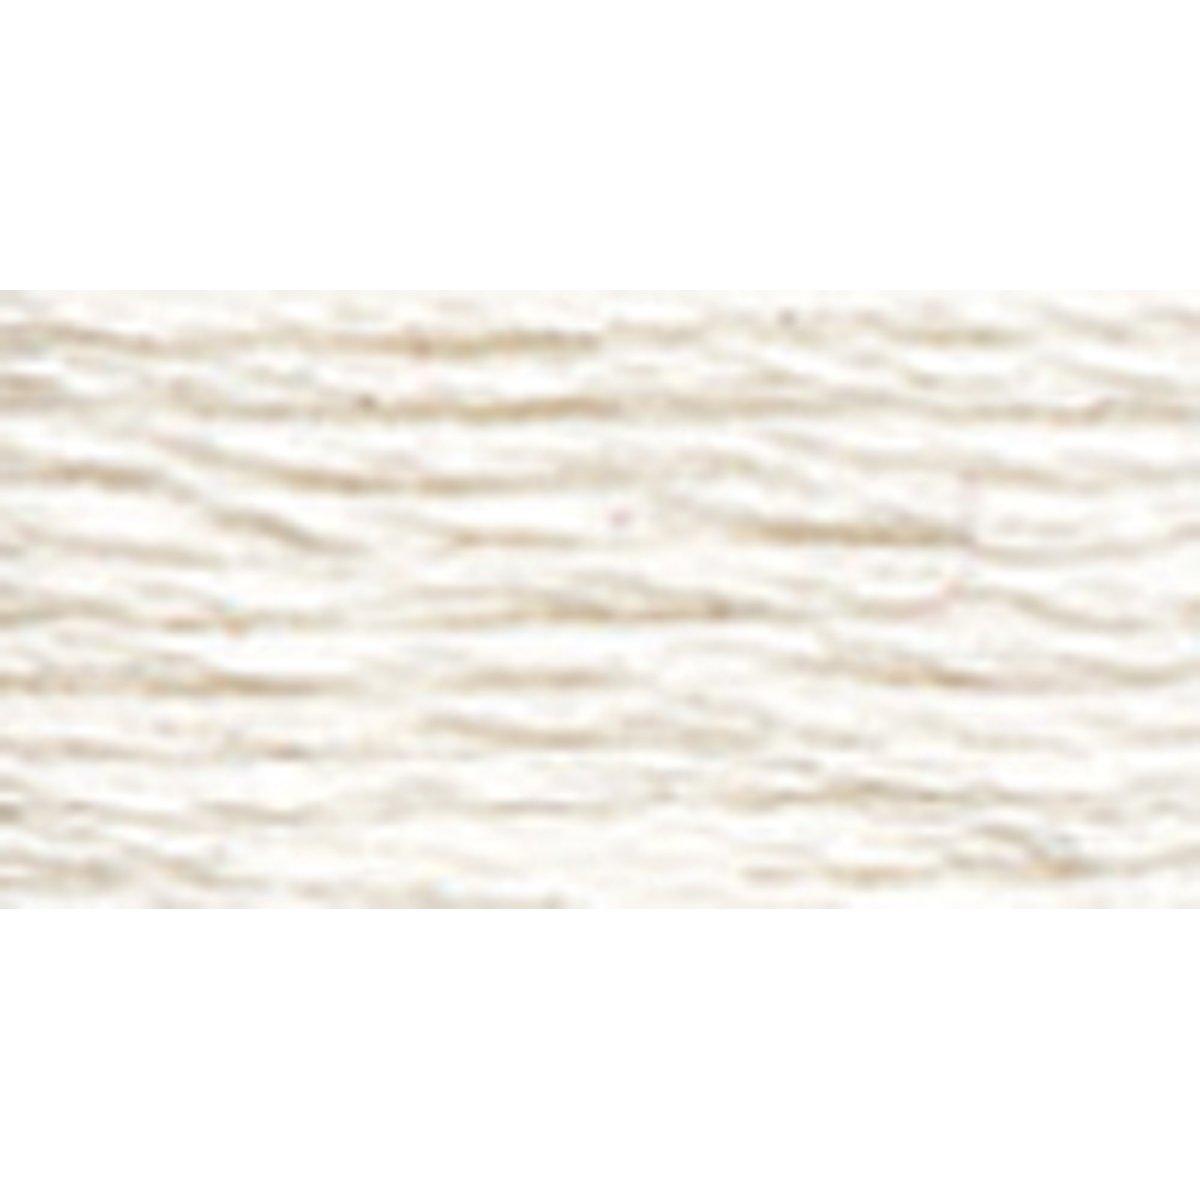 Size 5 Cream DMC 116 5-712 Pearl Cotton Thread Balls